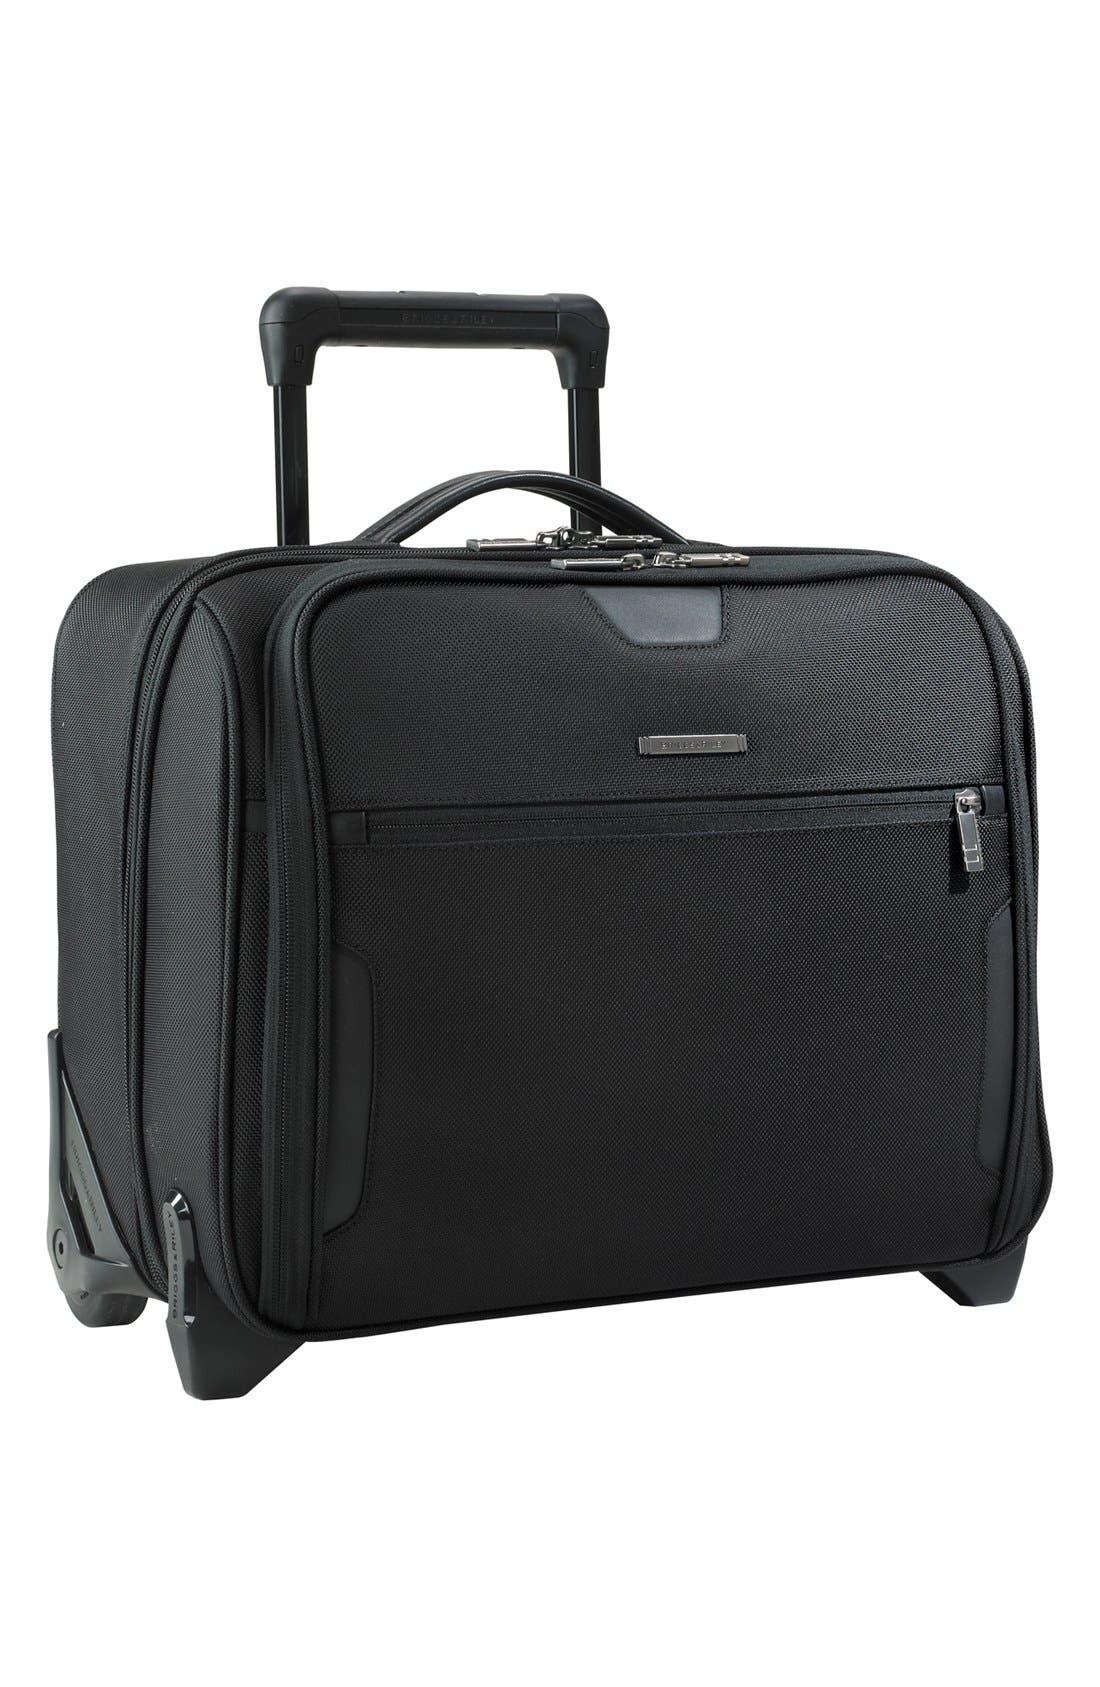 Main Image - Briggs & Riley 'Medium Slim' Rolling Ballistic Nylon Briefcase (16 Inch)